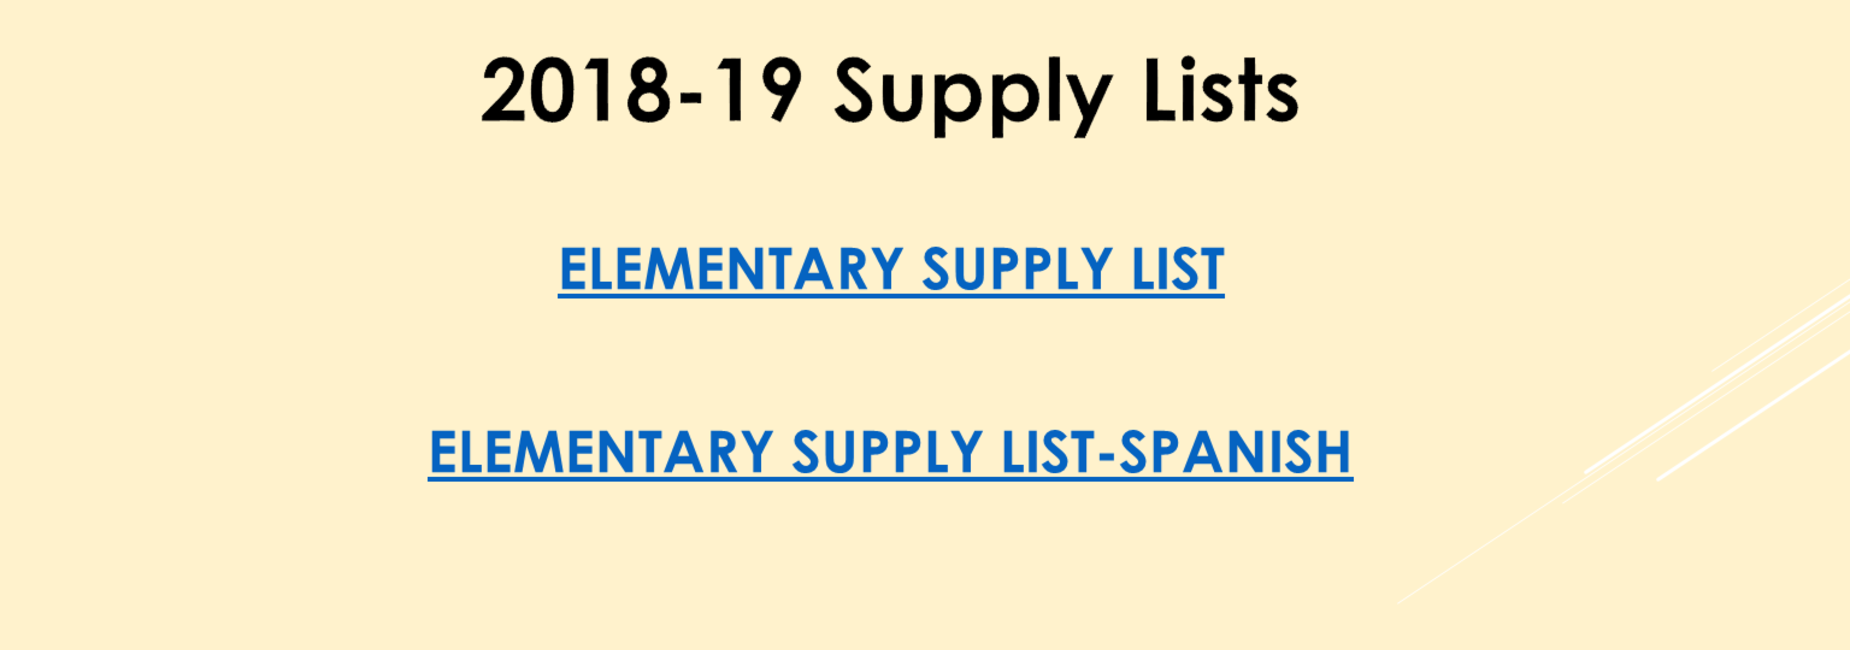 Elementary Supply List